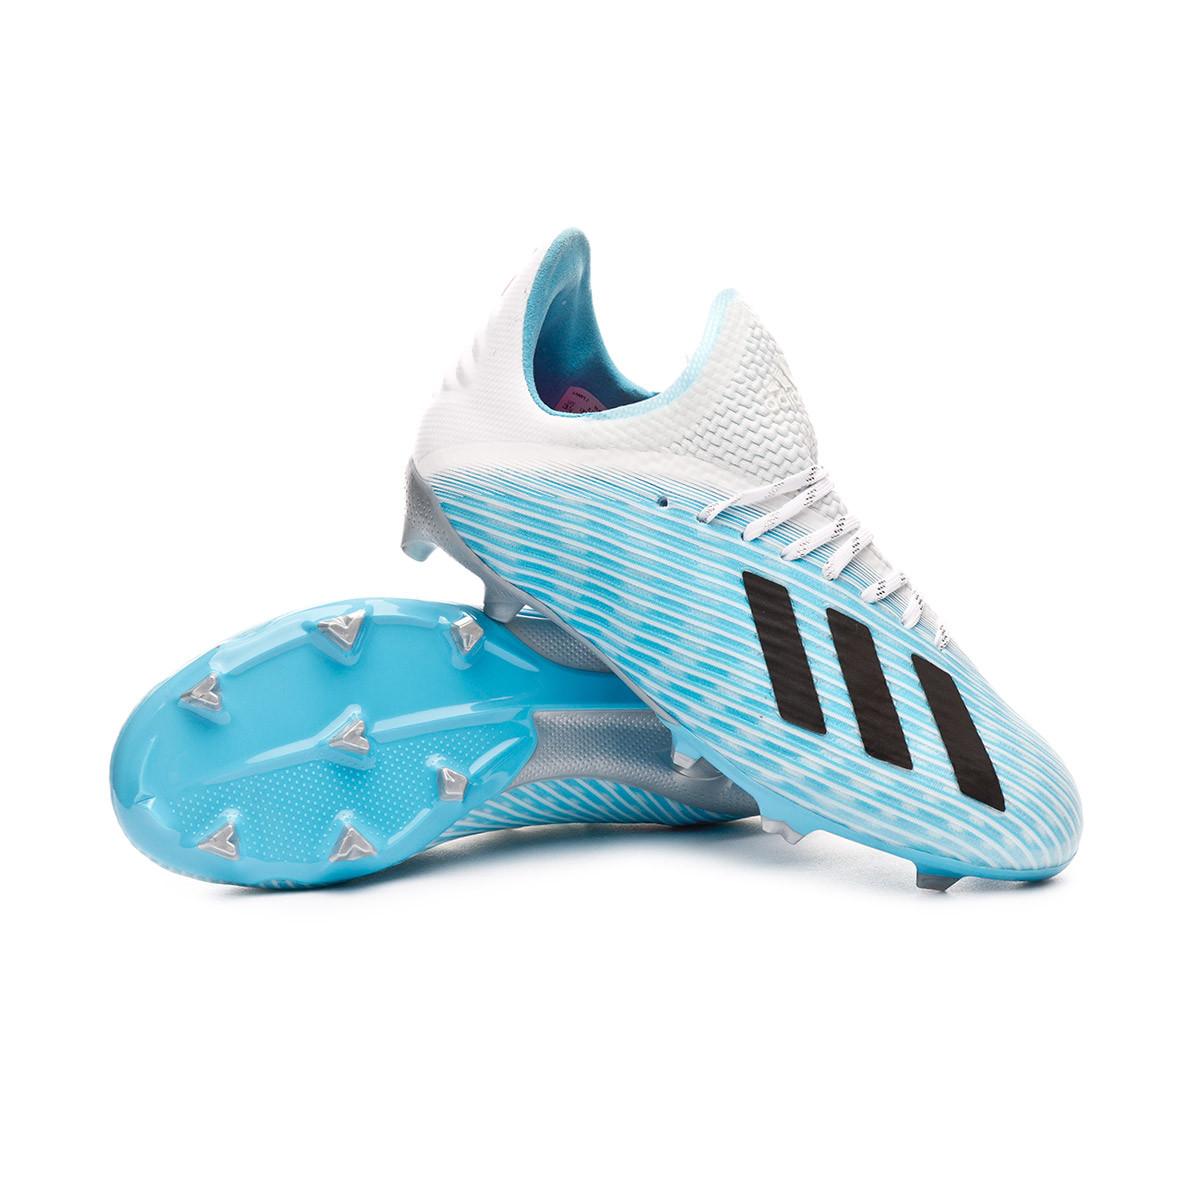 Chaussure de foot adidas X 19.1 FG Niño